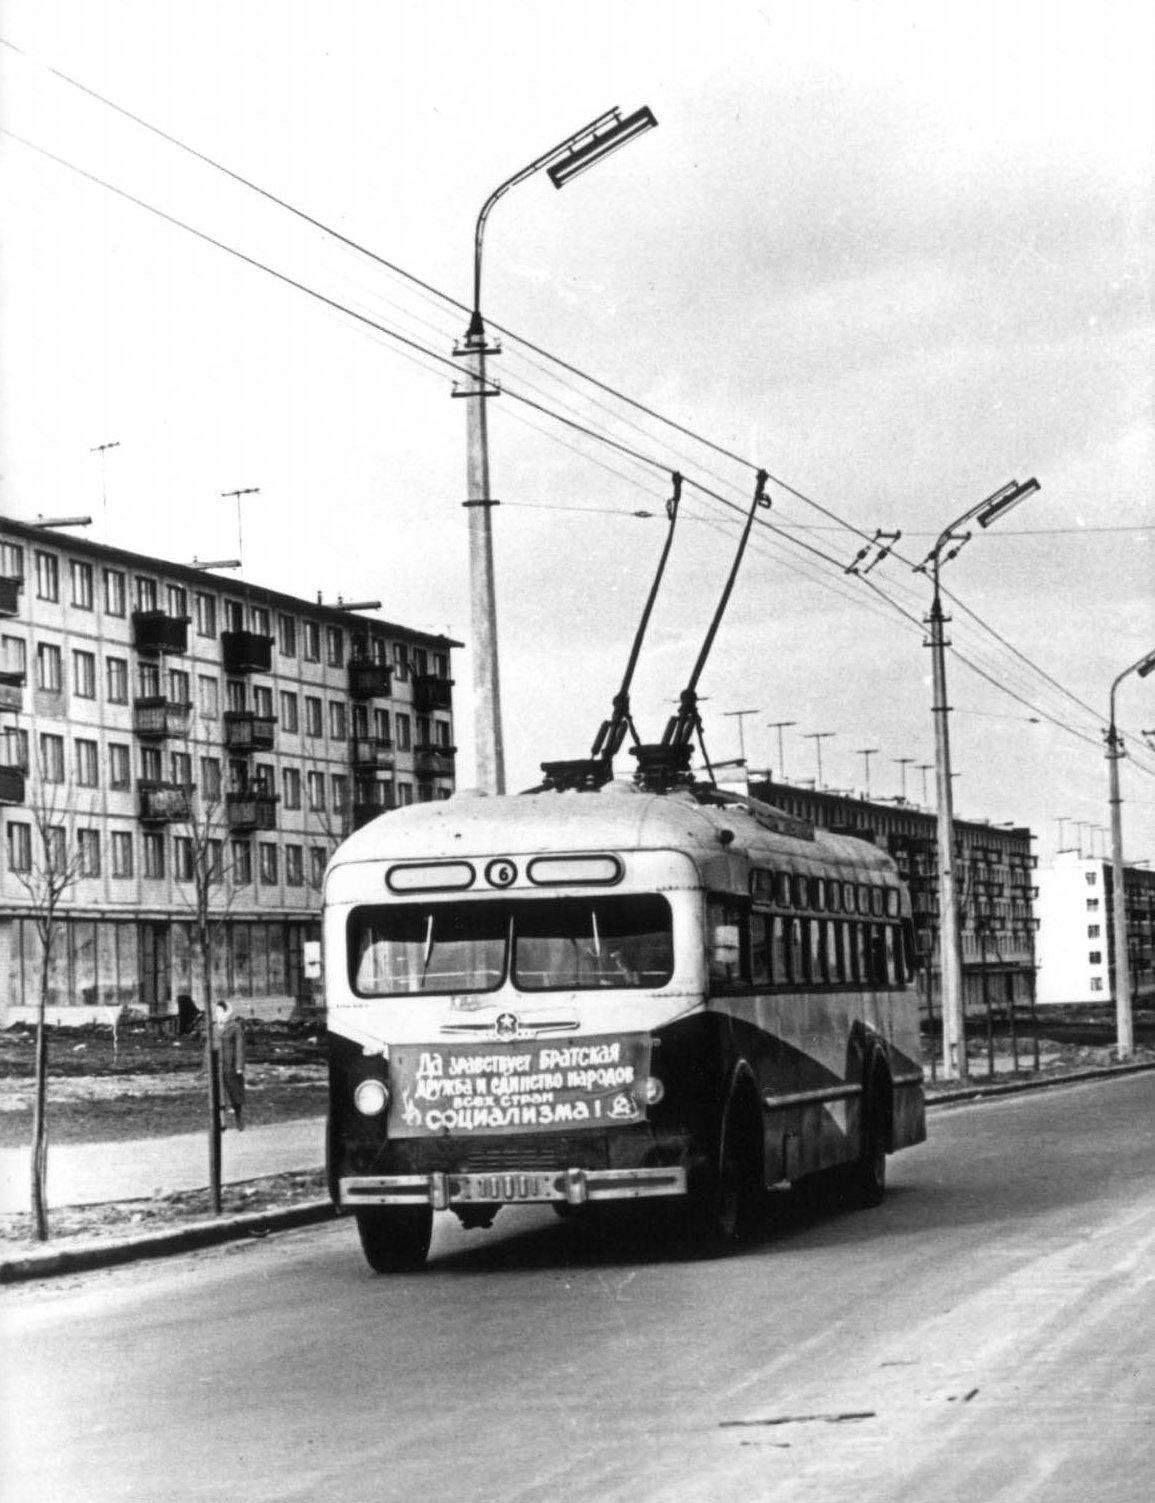 Реклама на билетах в тролейбусах 11 фотография